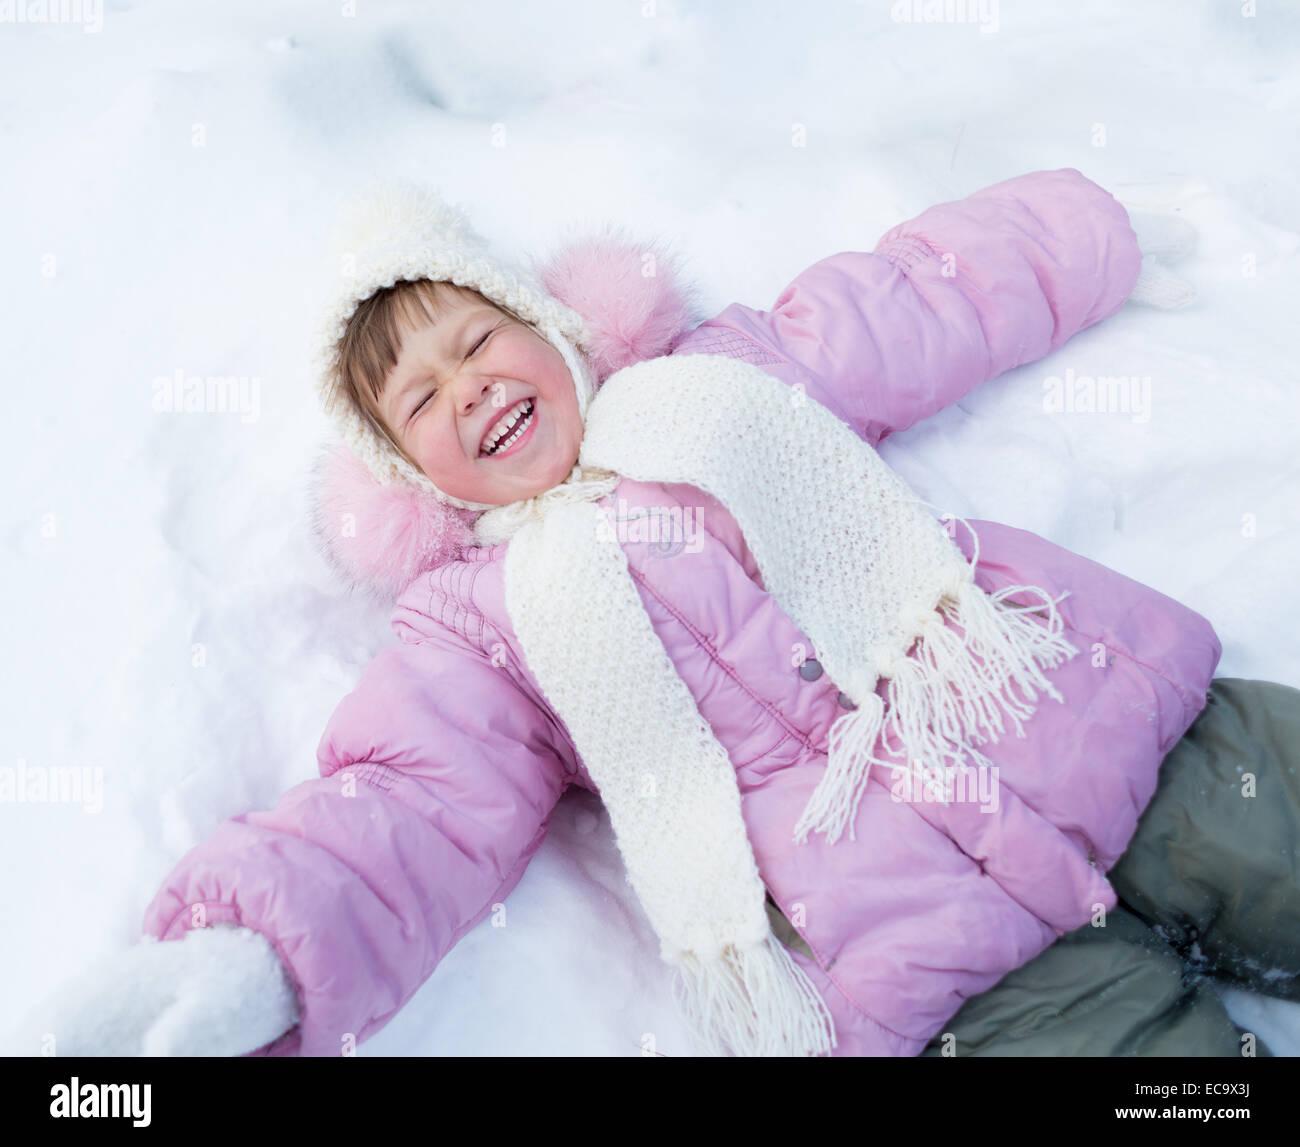 Happy kid lying on snow in winter outdoor - Stock Image